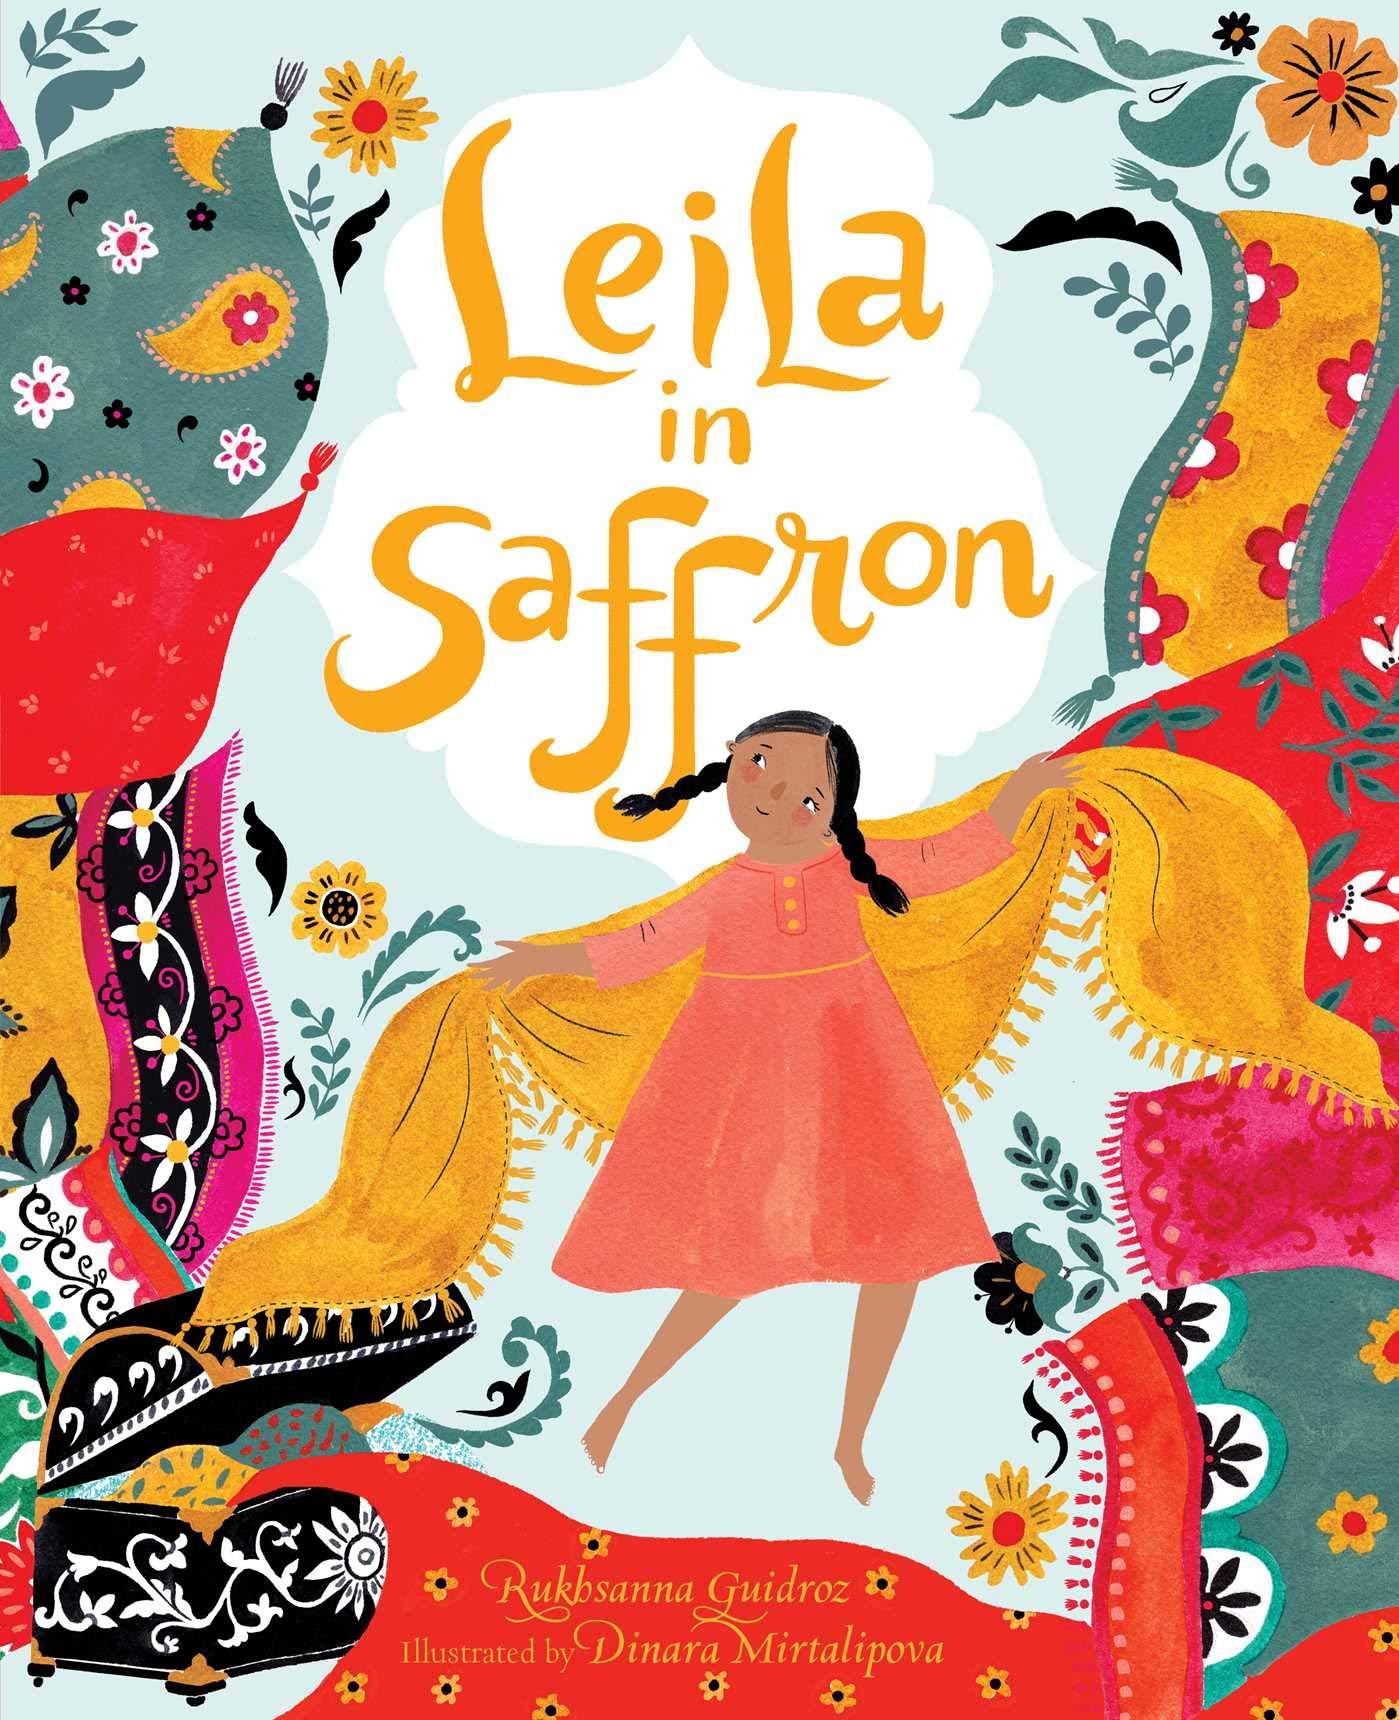 Amazon.com: Leila in Saffron (9781534425644): Guidroz, Rukhsanna, Mirtalipova, Dinara: Books